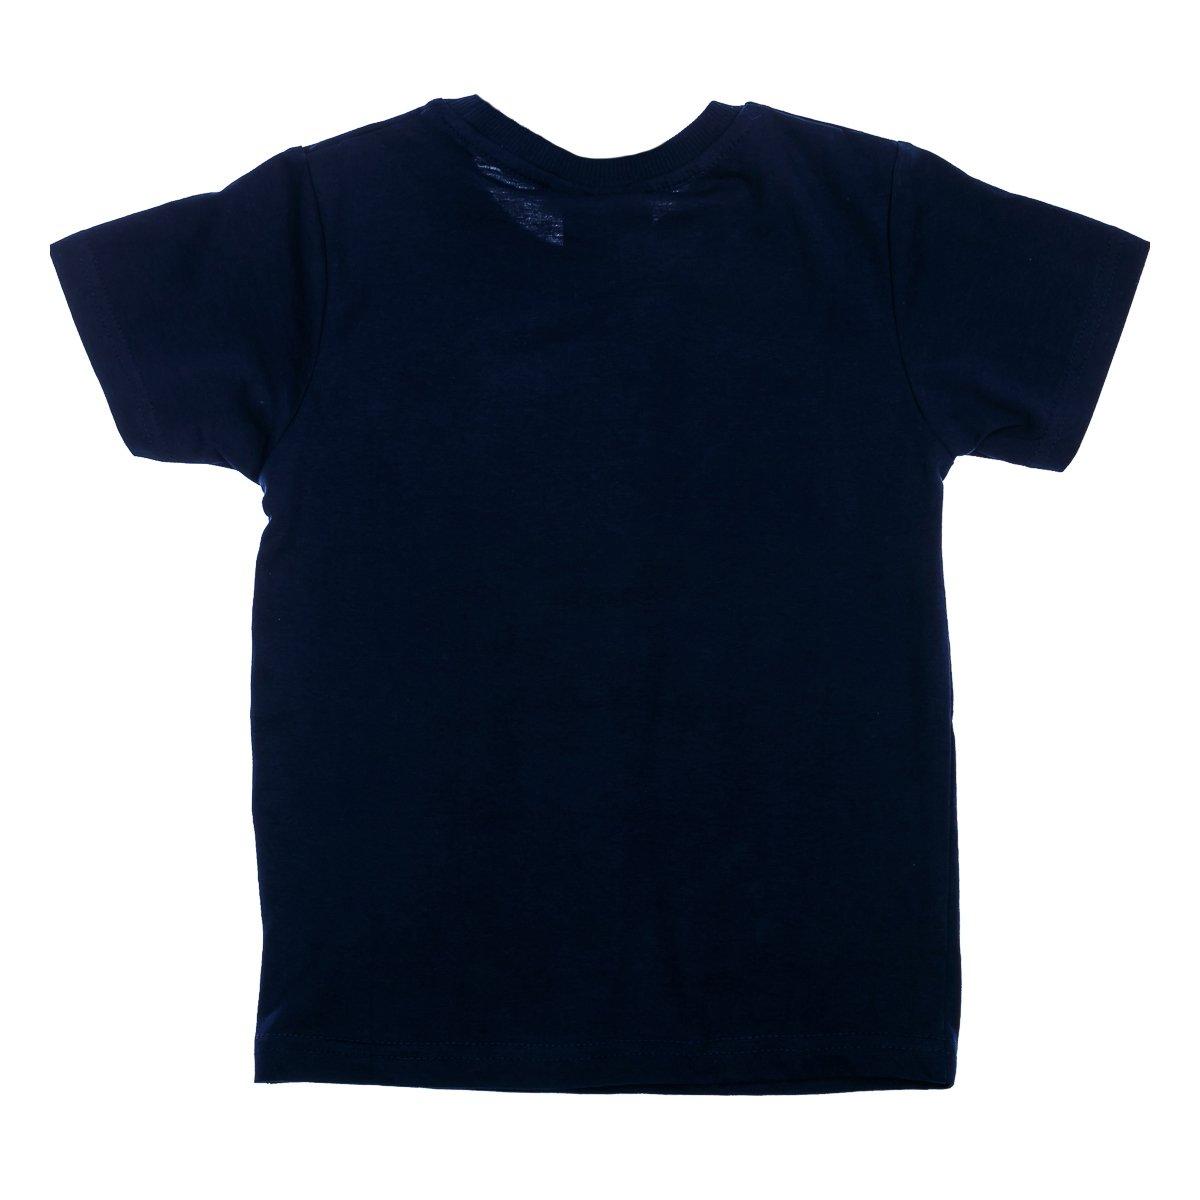 Купить Футболки, майки, топы, туники, Футболка E Plus M Batman Blue, р. 146 BAT5202184 ТМ: E Plus M, синий